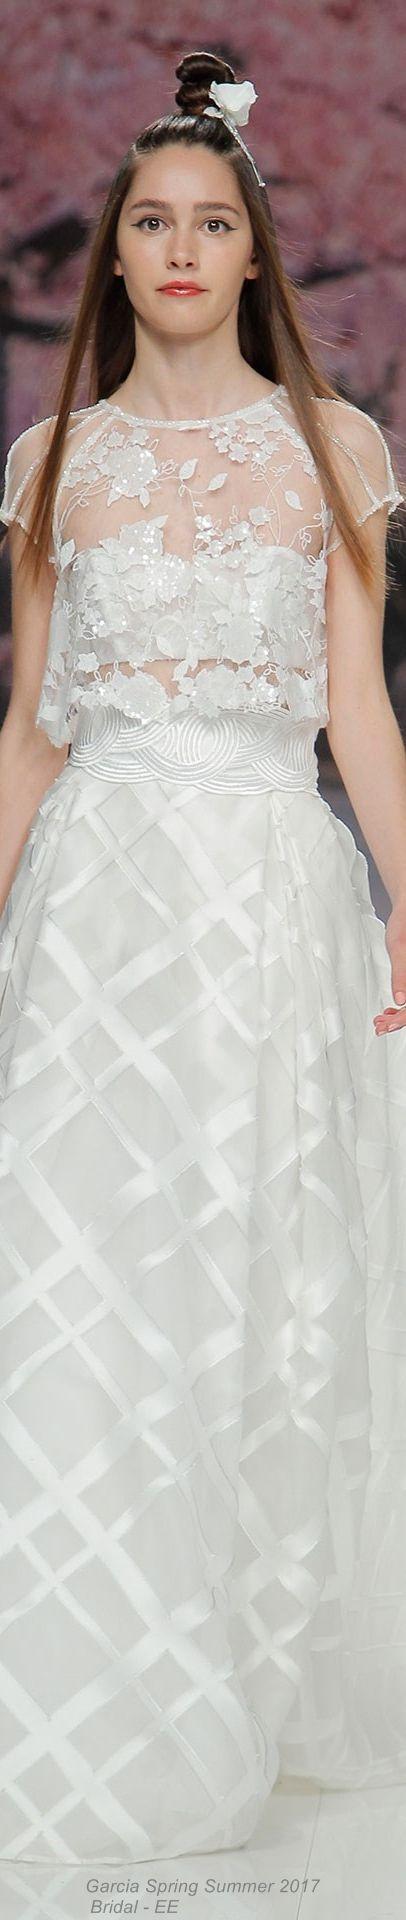 50 best Ethereal Romantic Wedding Dresses images on Pinterest ...